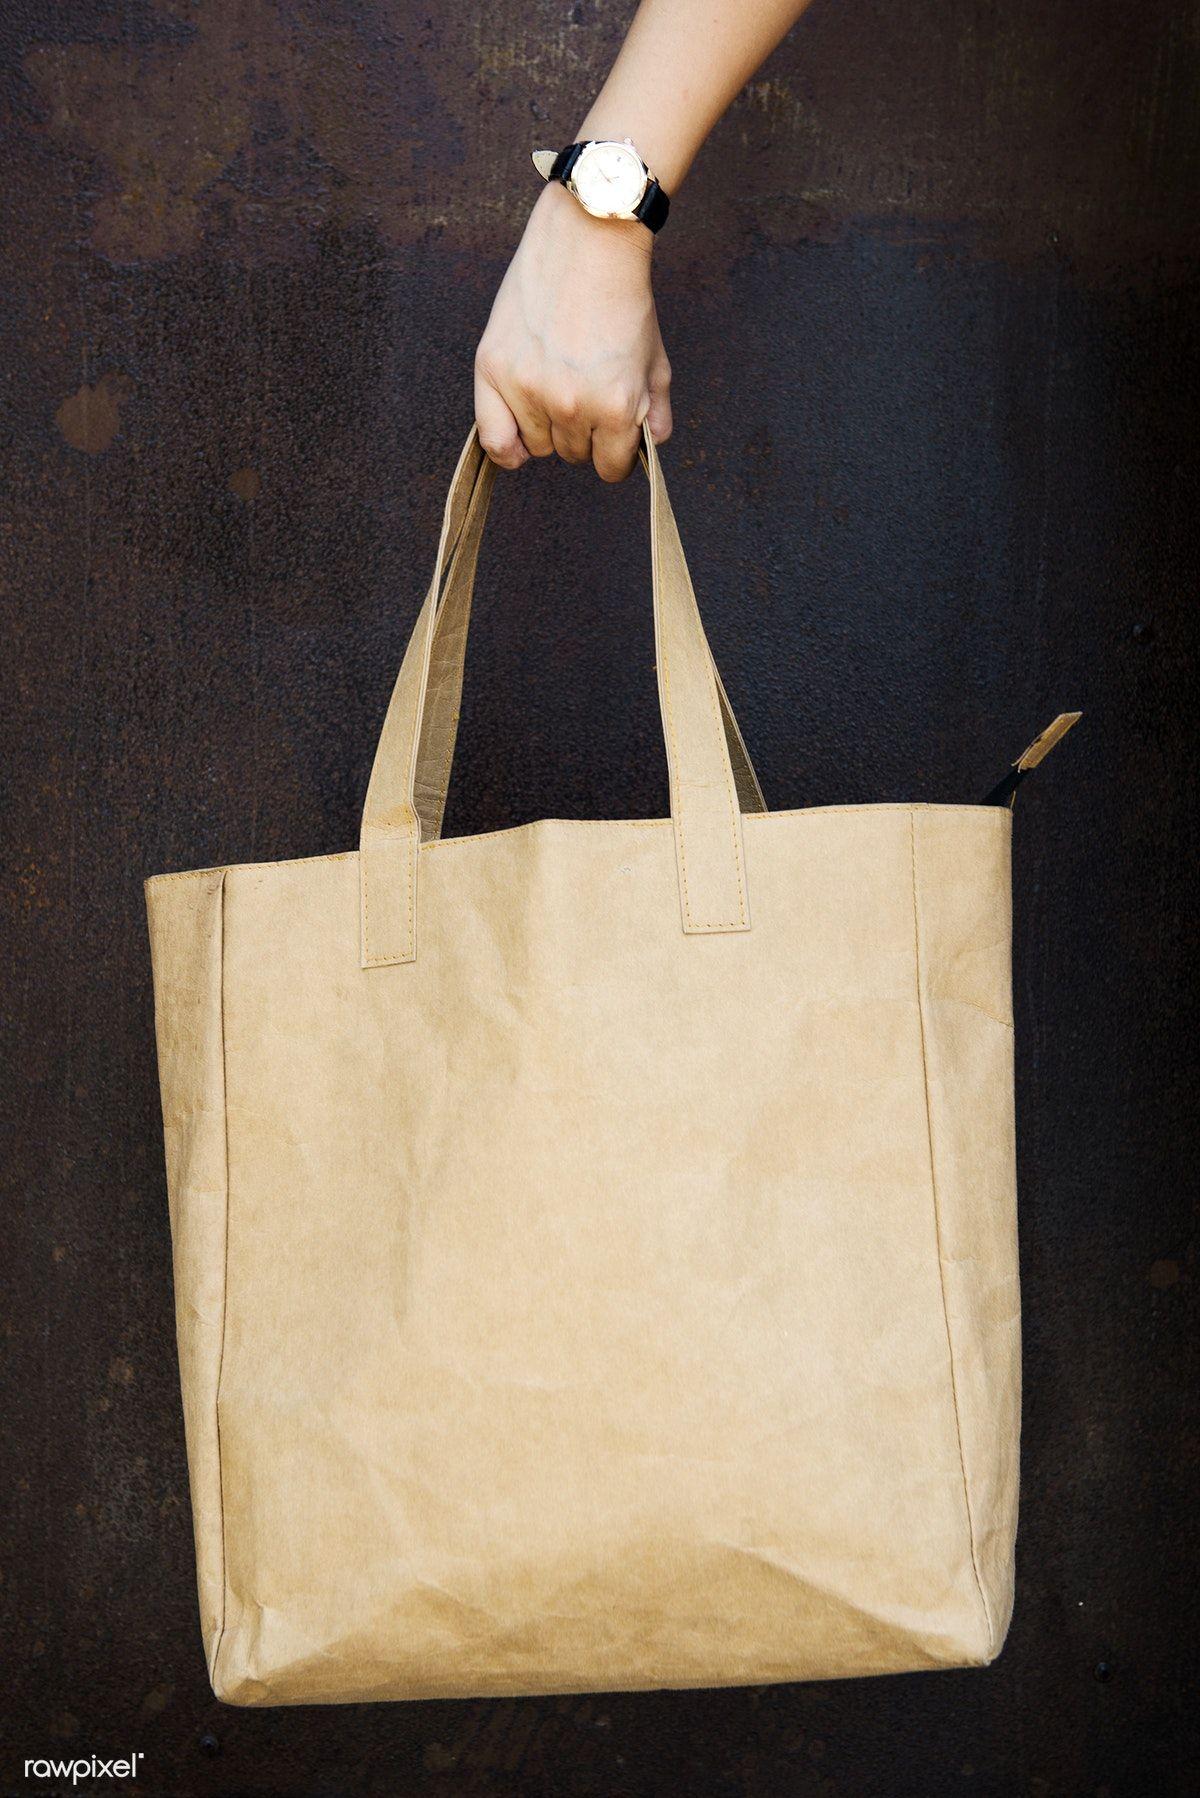 Download Download Premium Psd Of Design Space On Blank Tote Bag 295451 Blank Tote Bag Shopping Bag Design Tote Bag